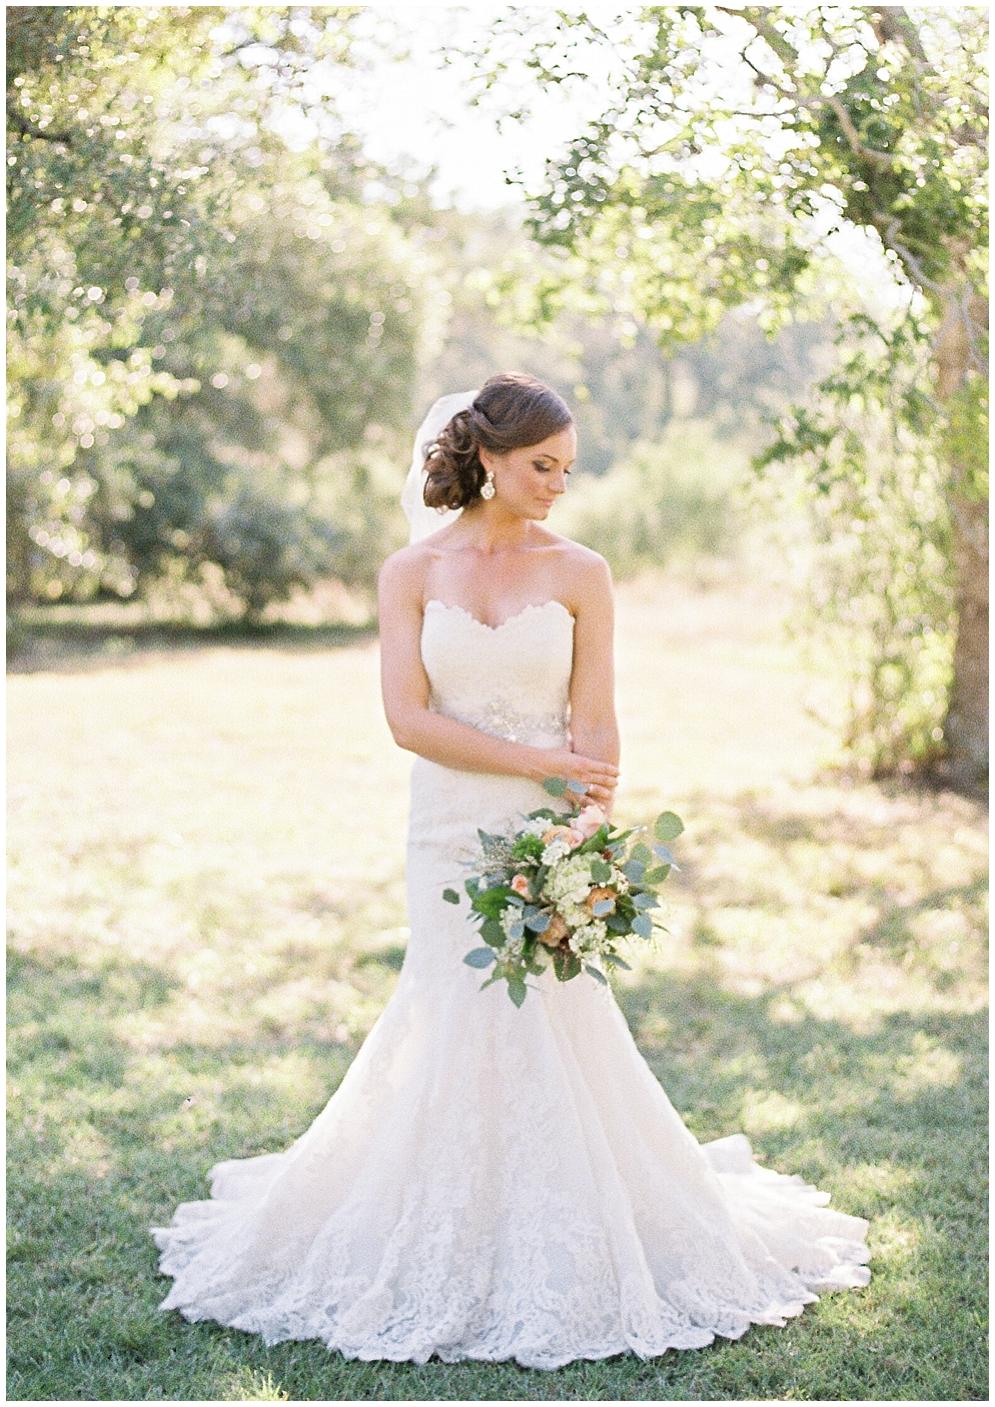 Pecan Springs Ranch | Bridal | Film | Austin Wedding Photographer-19.jpg